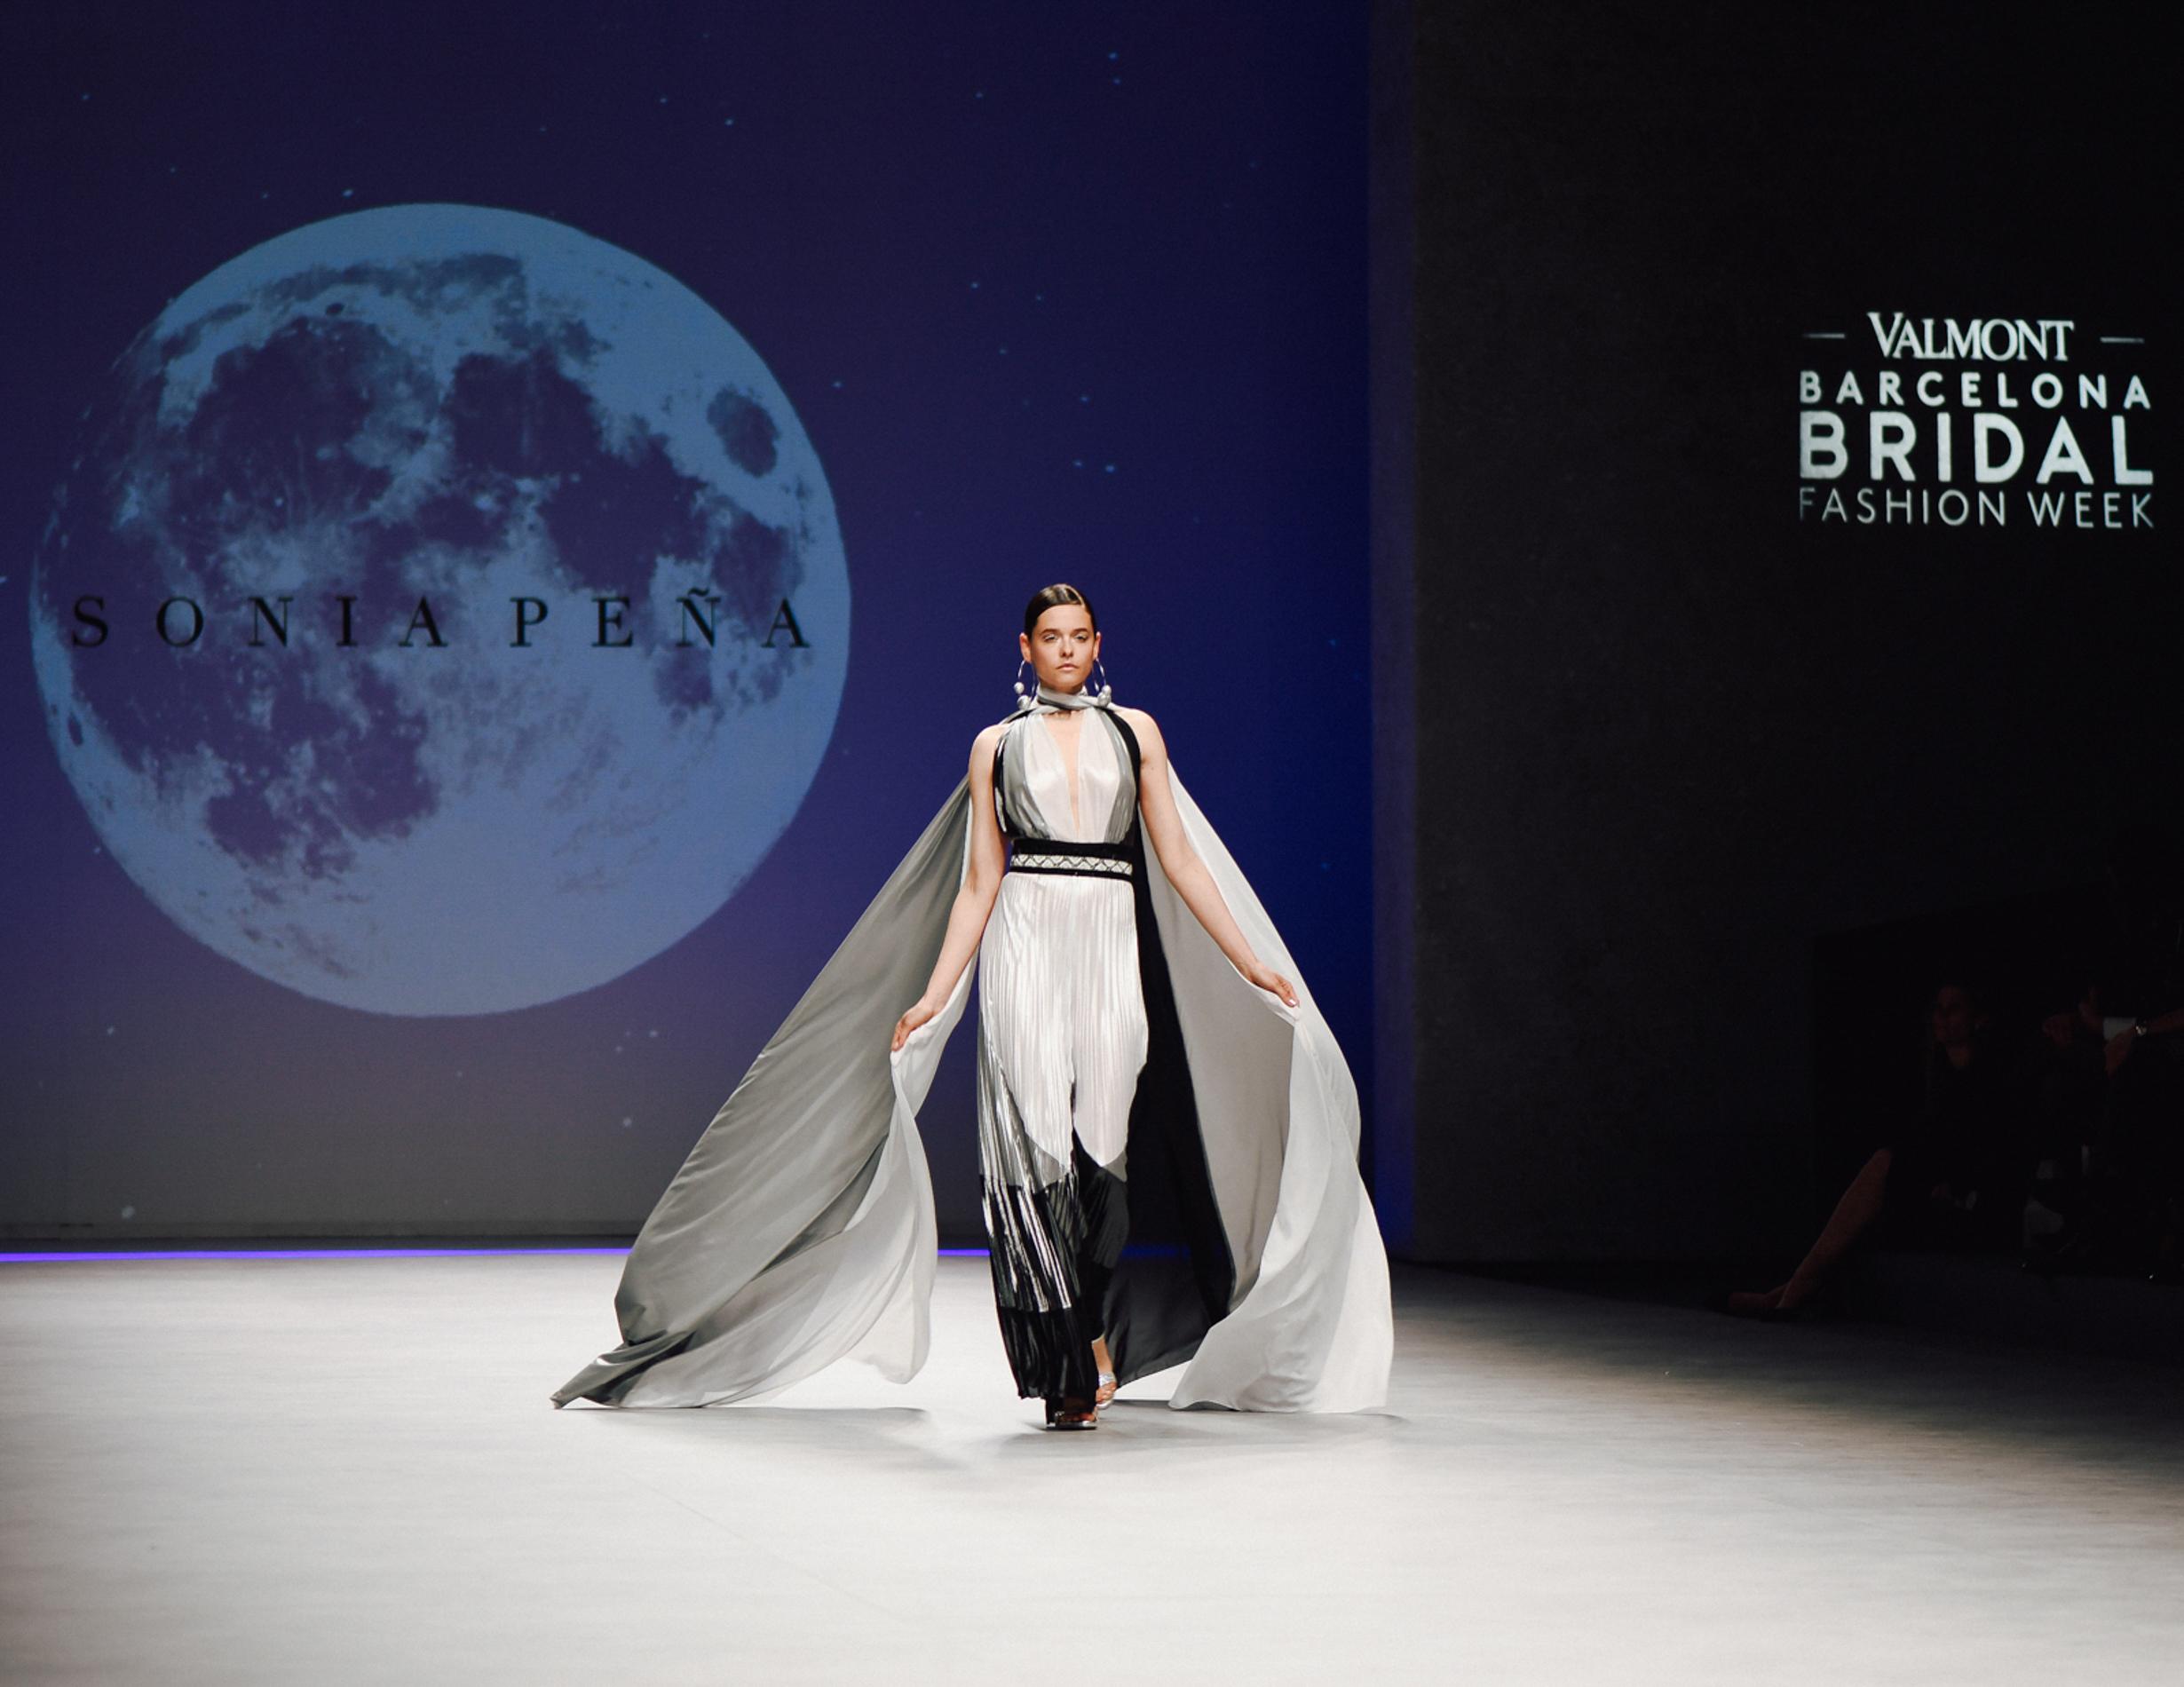 <span>Fashion Week</span>Sonia Peña